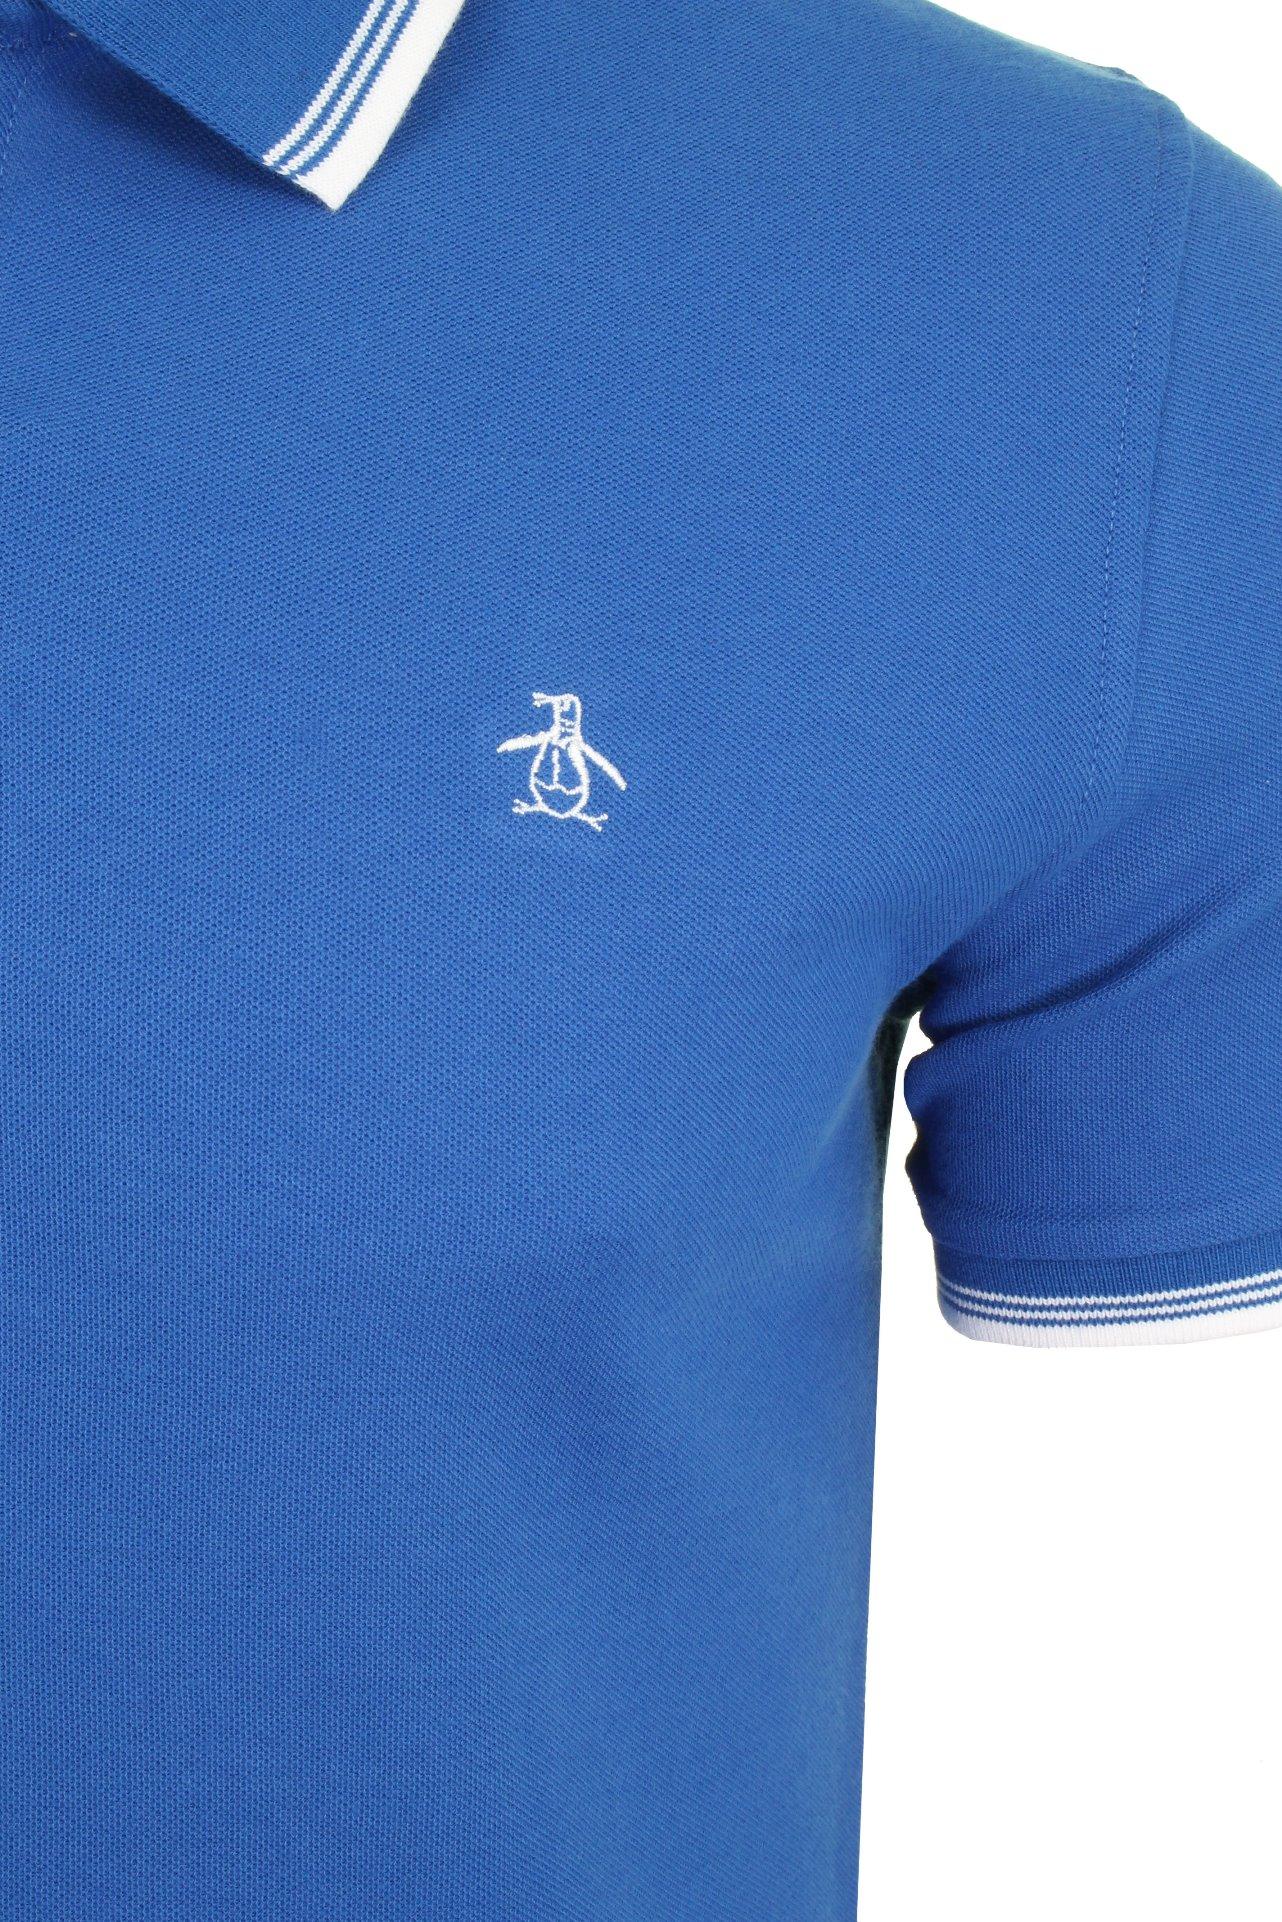 Mens Original Penguin Tipped Pique Polo T-Shirt Short Sleeved